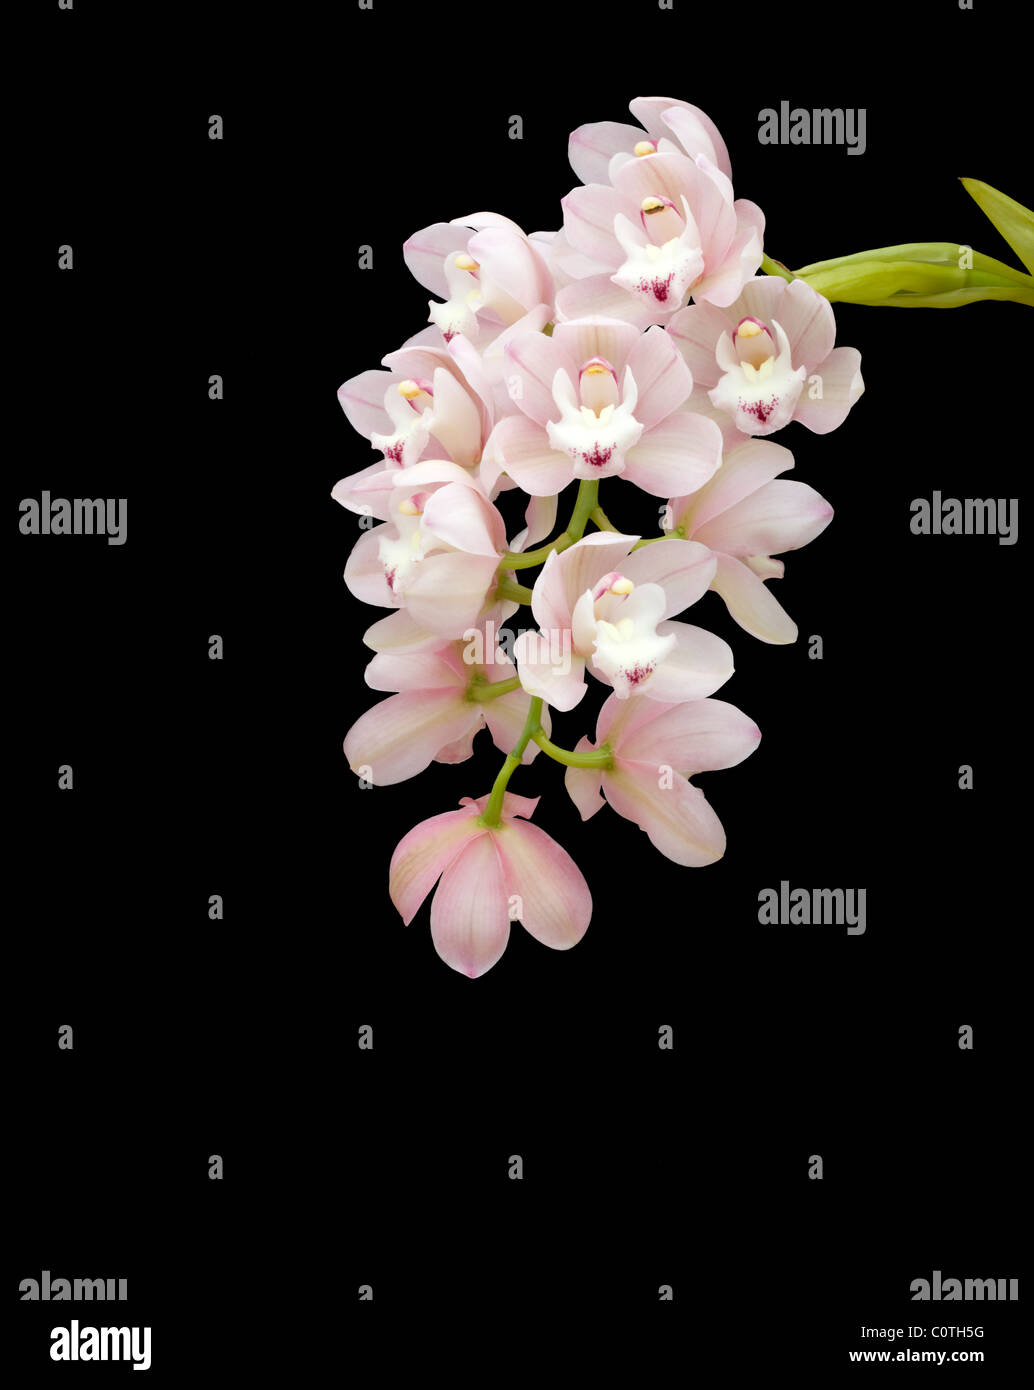 Cymbidium orchids against black background - Stock Image